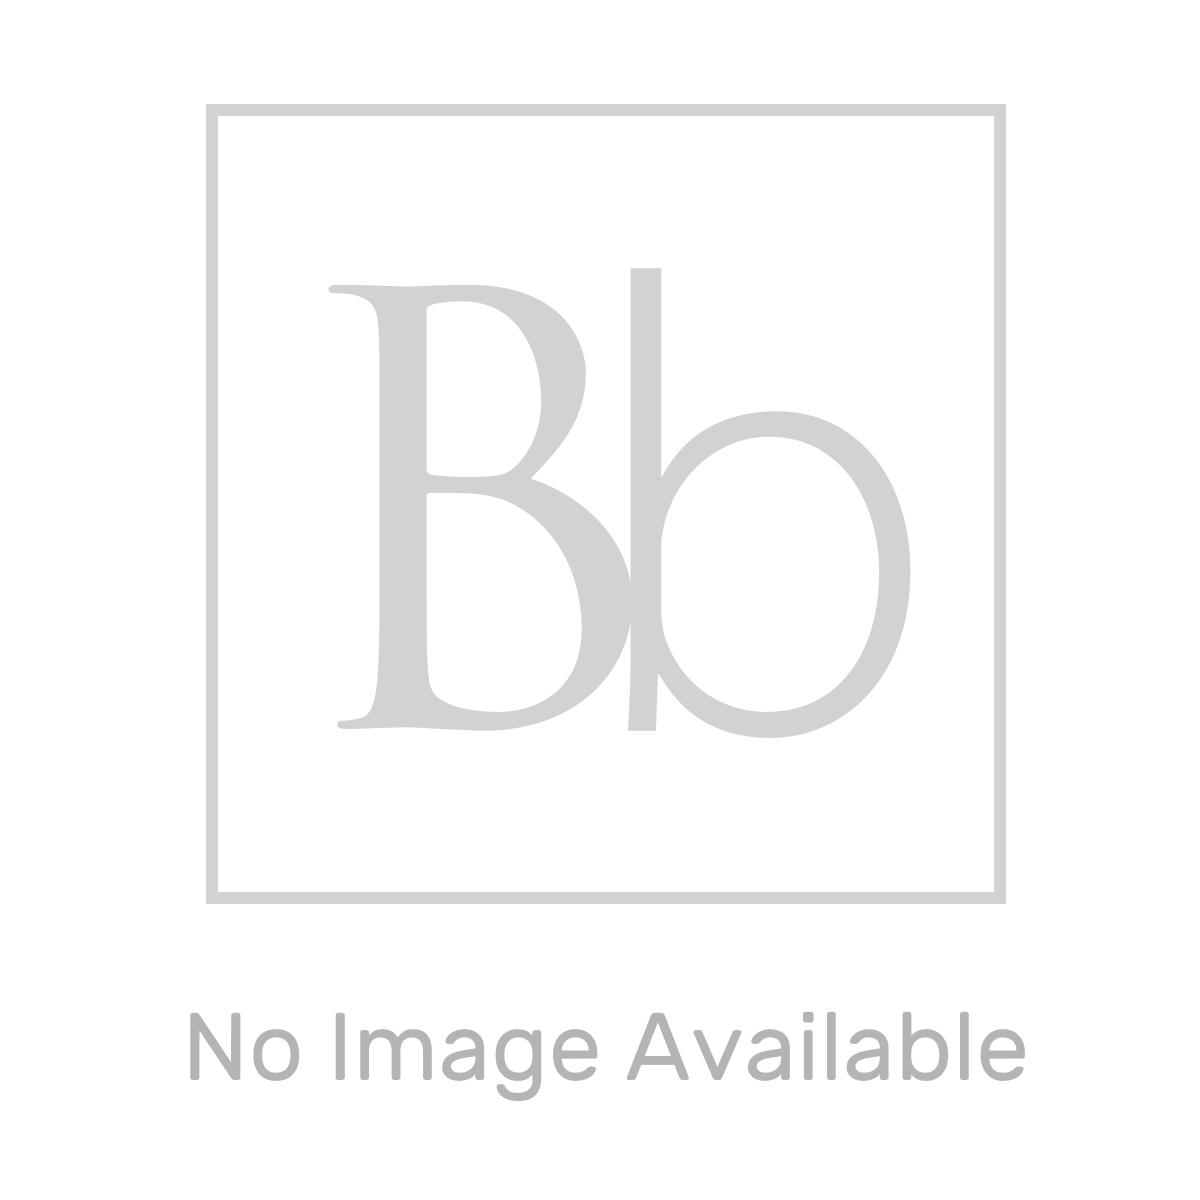 April Offset Quadrant Anti Slip Shower Tray 1200 x 900 Right Hand Line Drawing